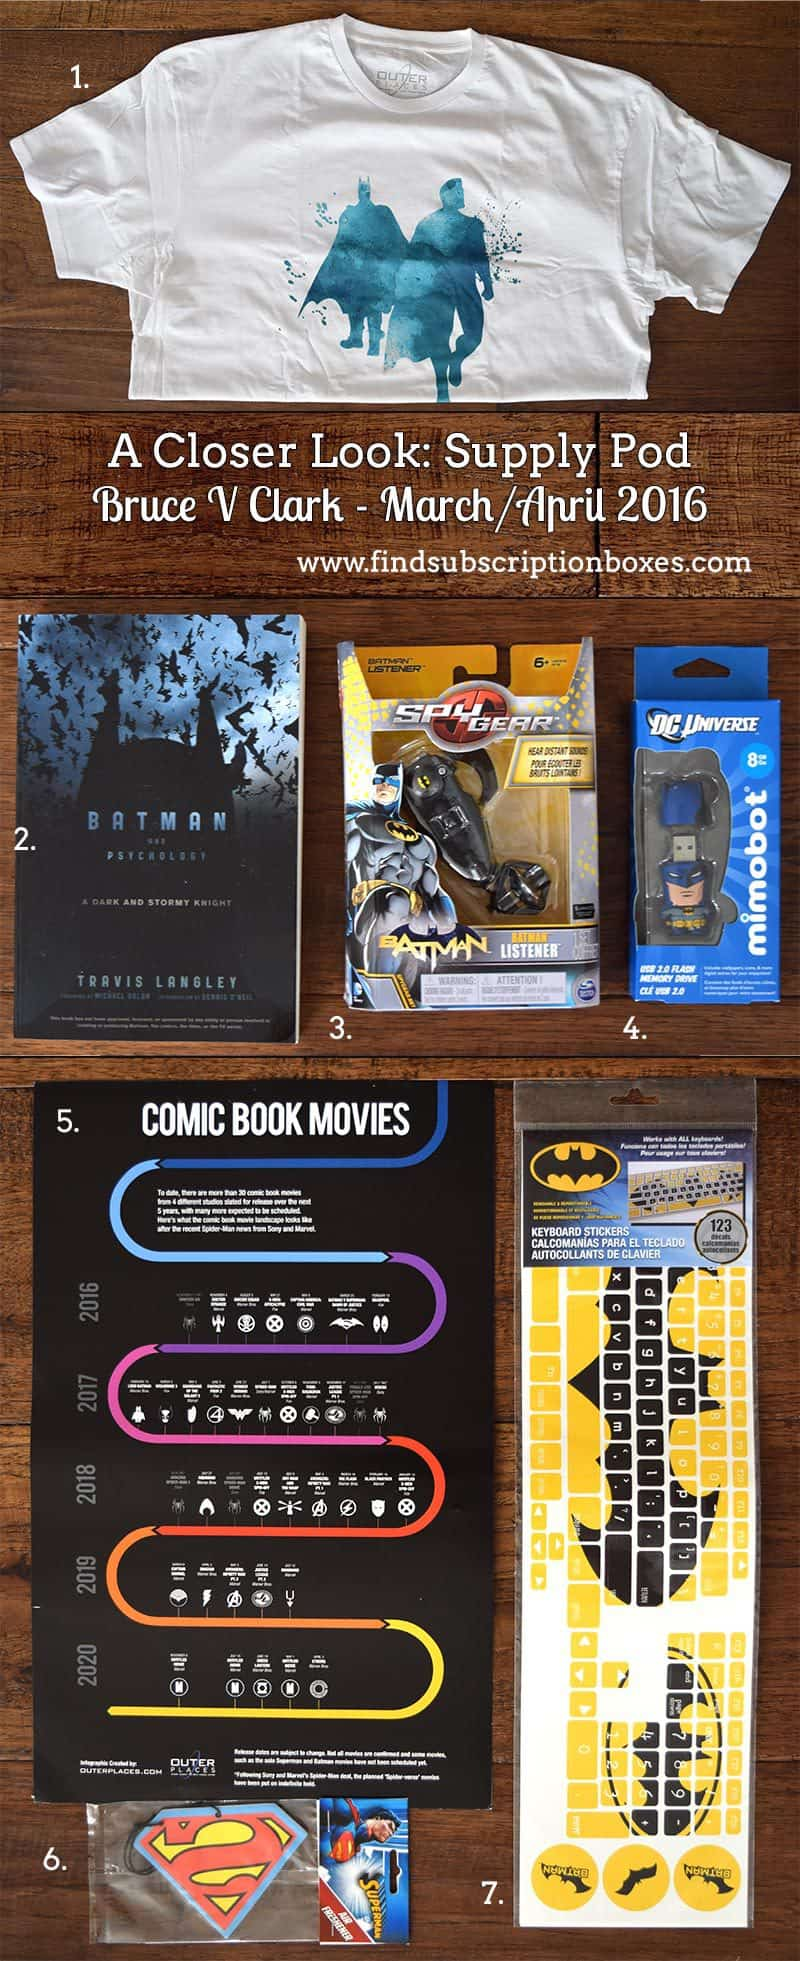 Supply Pod Bruce V Clark Review - Inside the Box